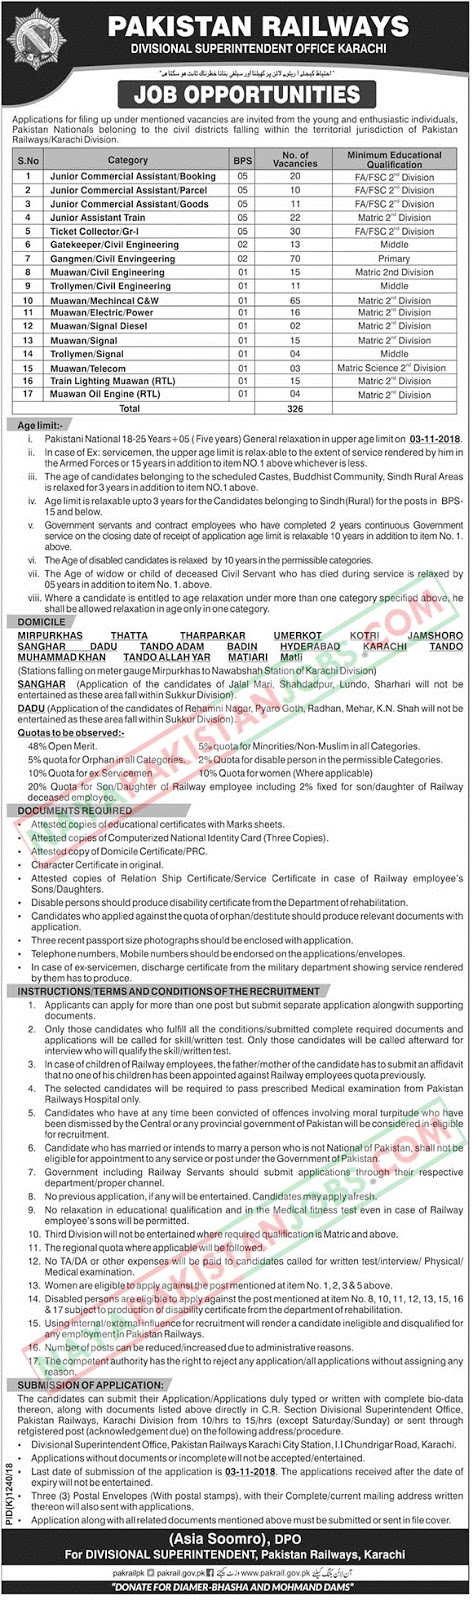 Latest Vacancies Announced in Pakistan Railways Karachi Division 4 October 2018 - Naya Pakistan